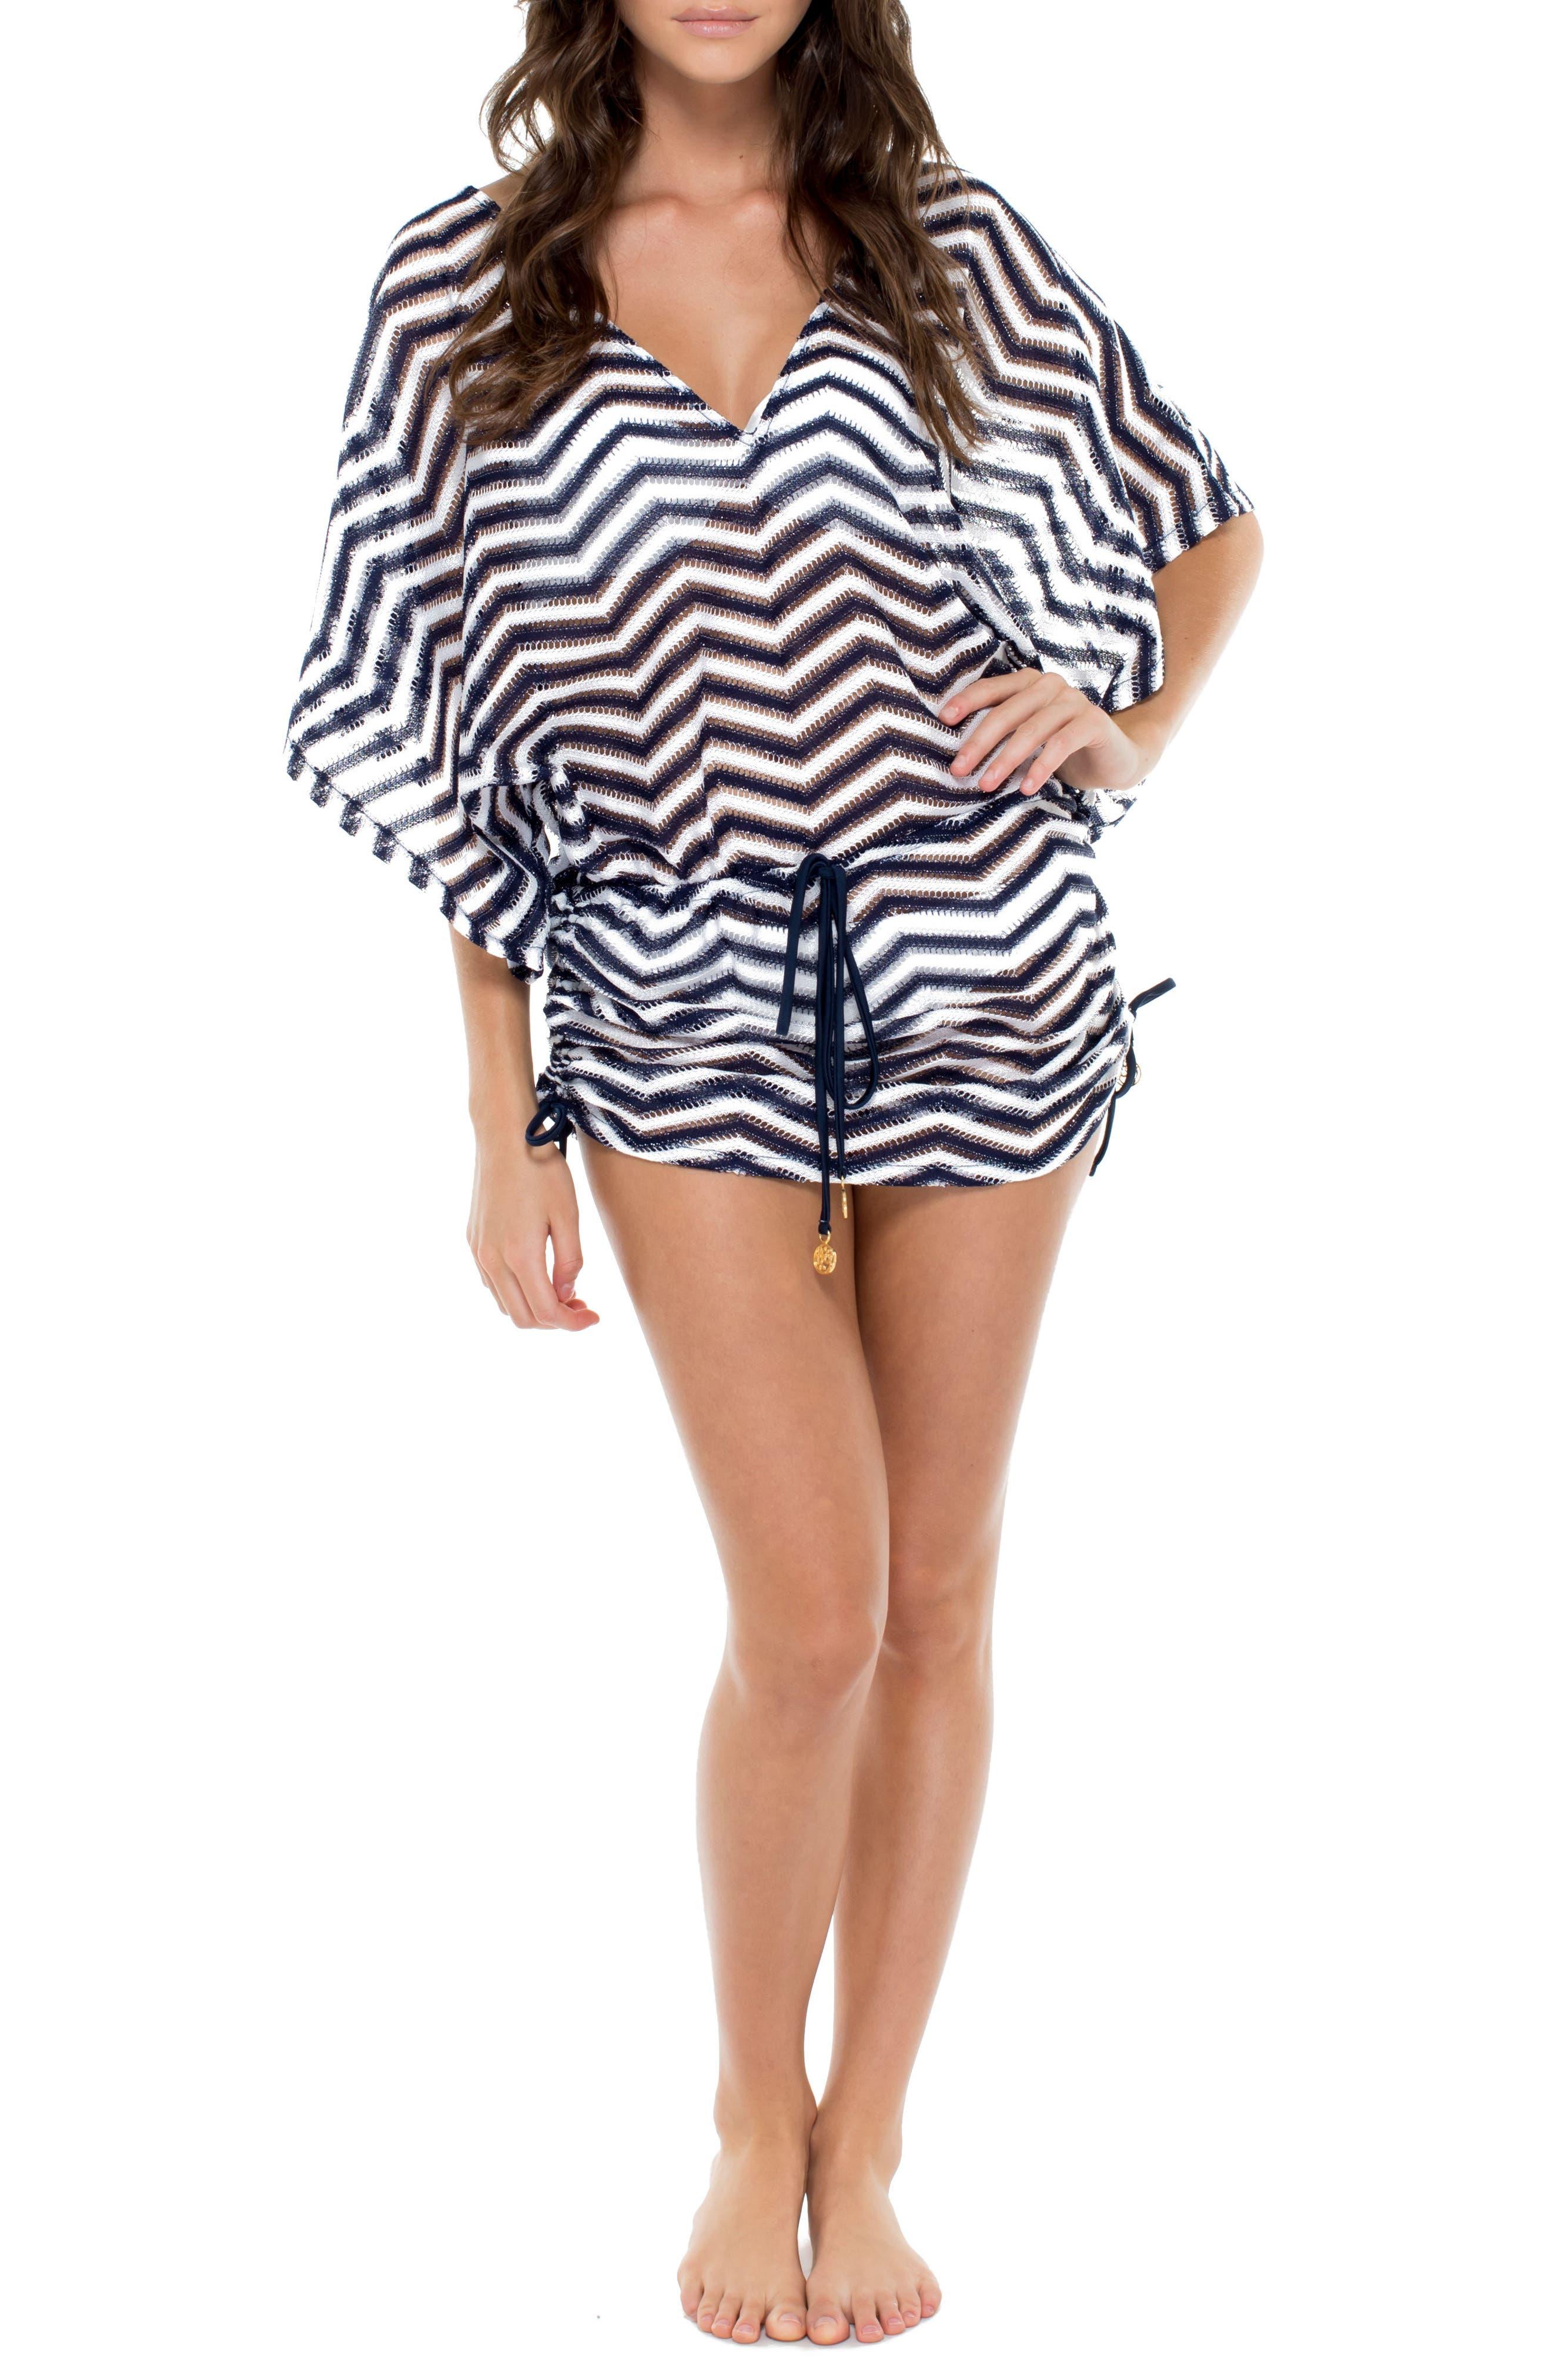 Alternate Image 1 Selected - Luli Fama Cabana Cover-Up Dress